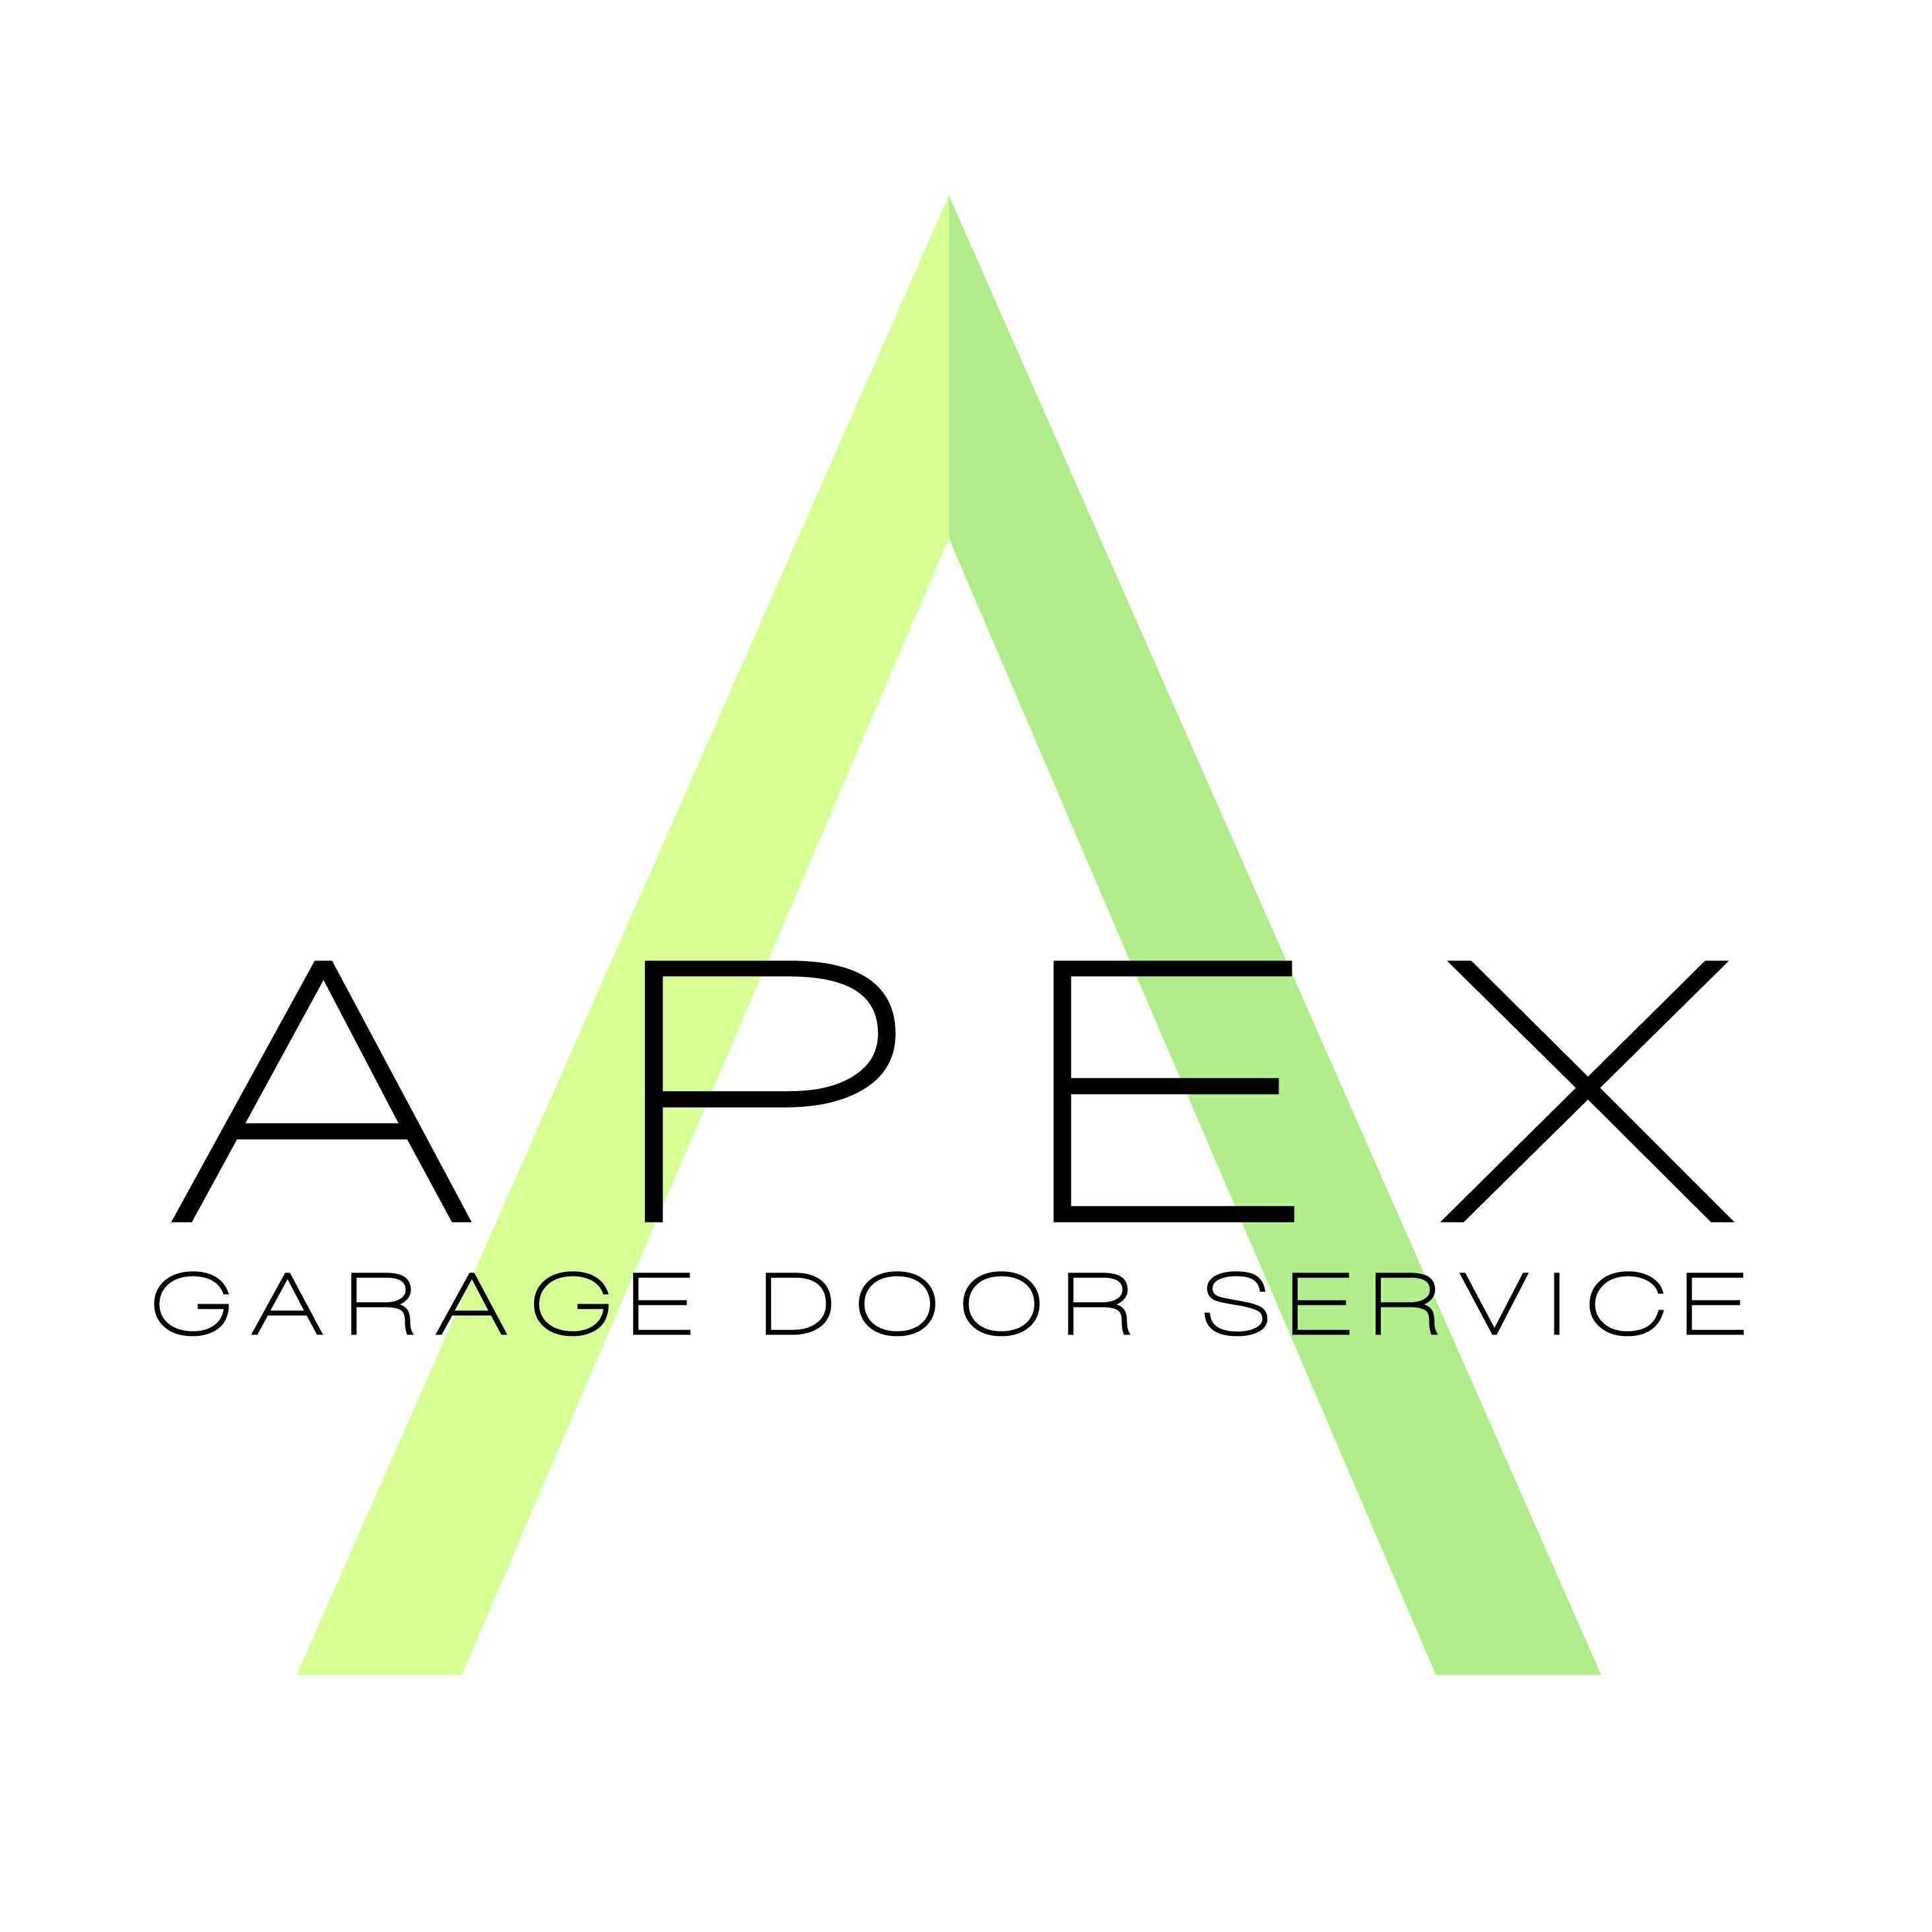 Apex garage doors nj httpvoteno123 pinterest garage apex garage doors nj rubansaba